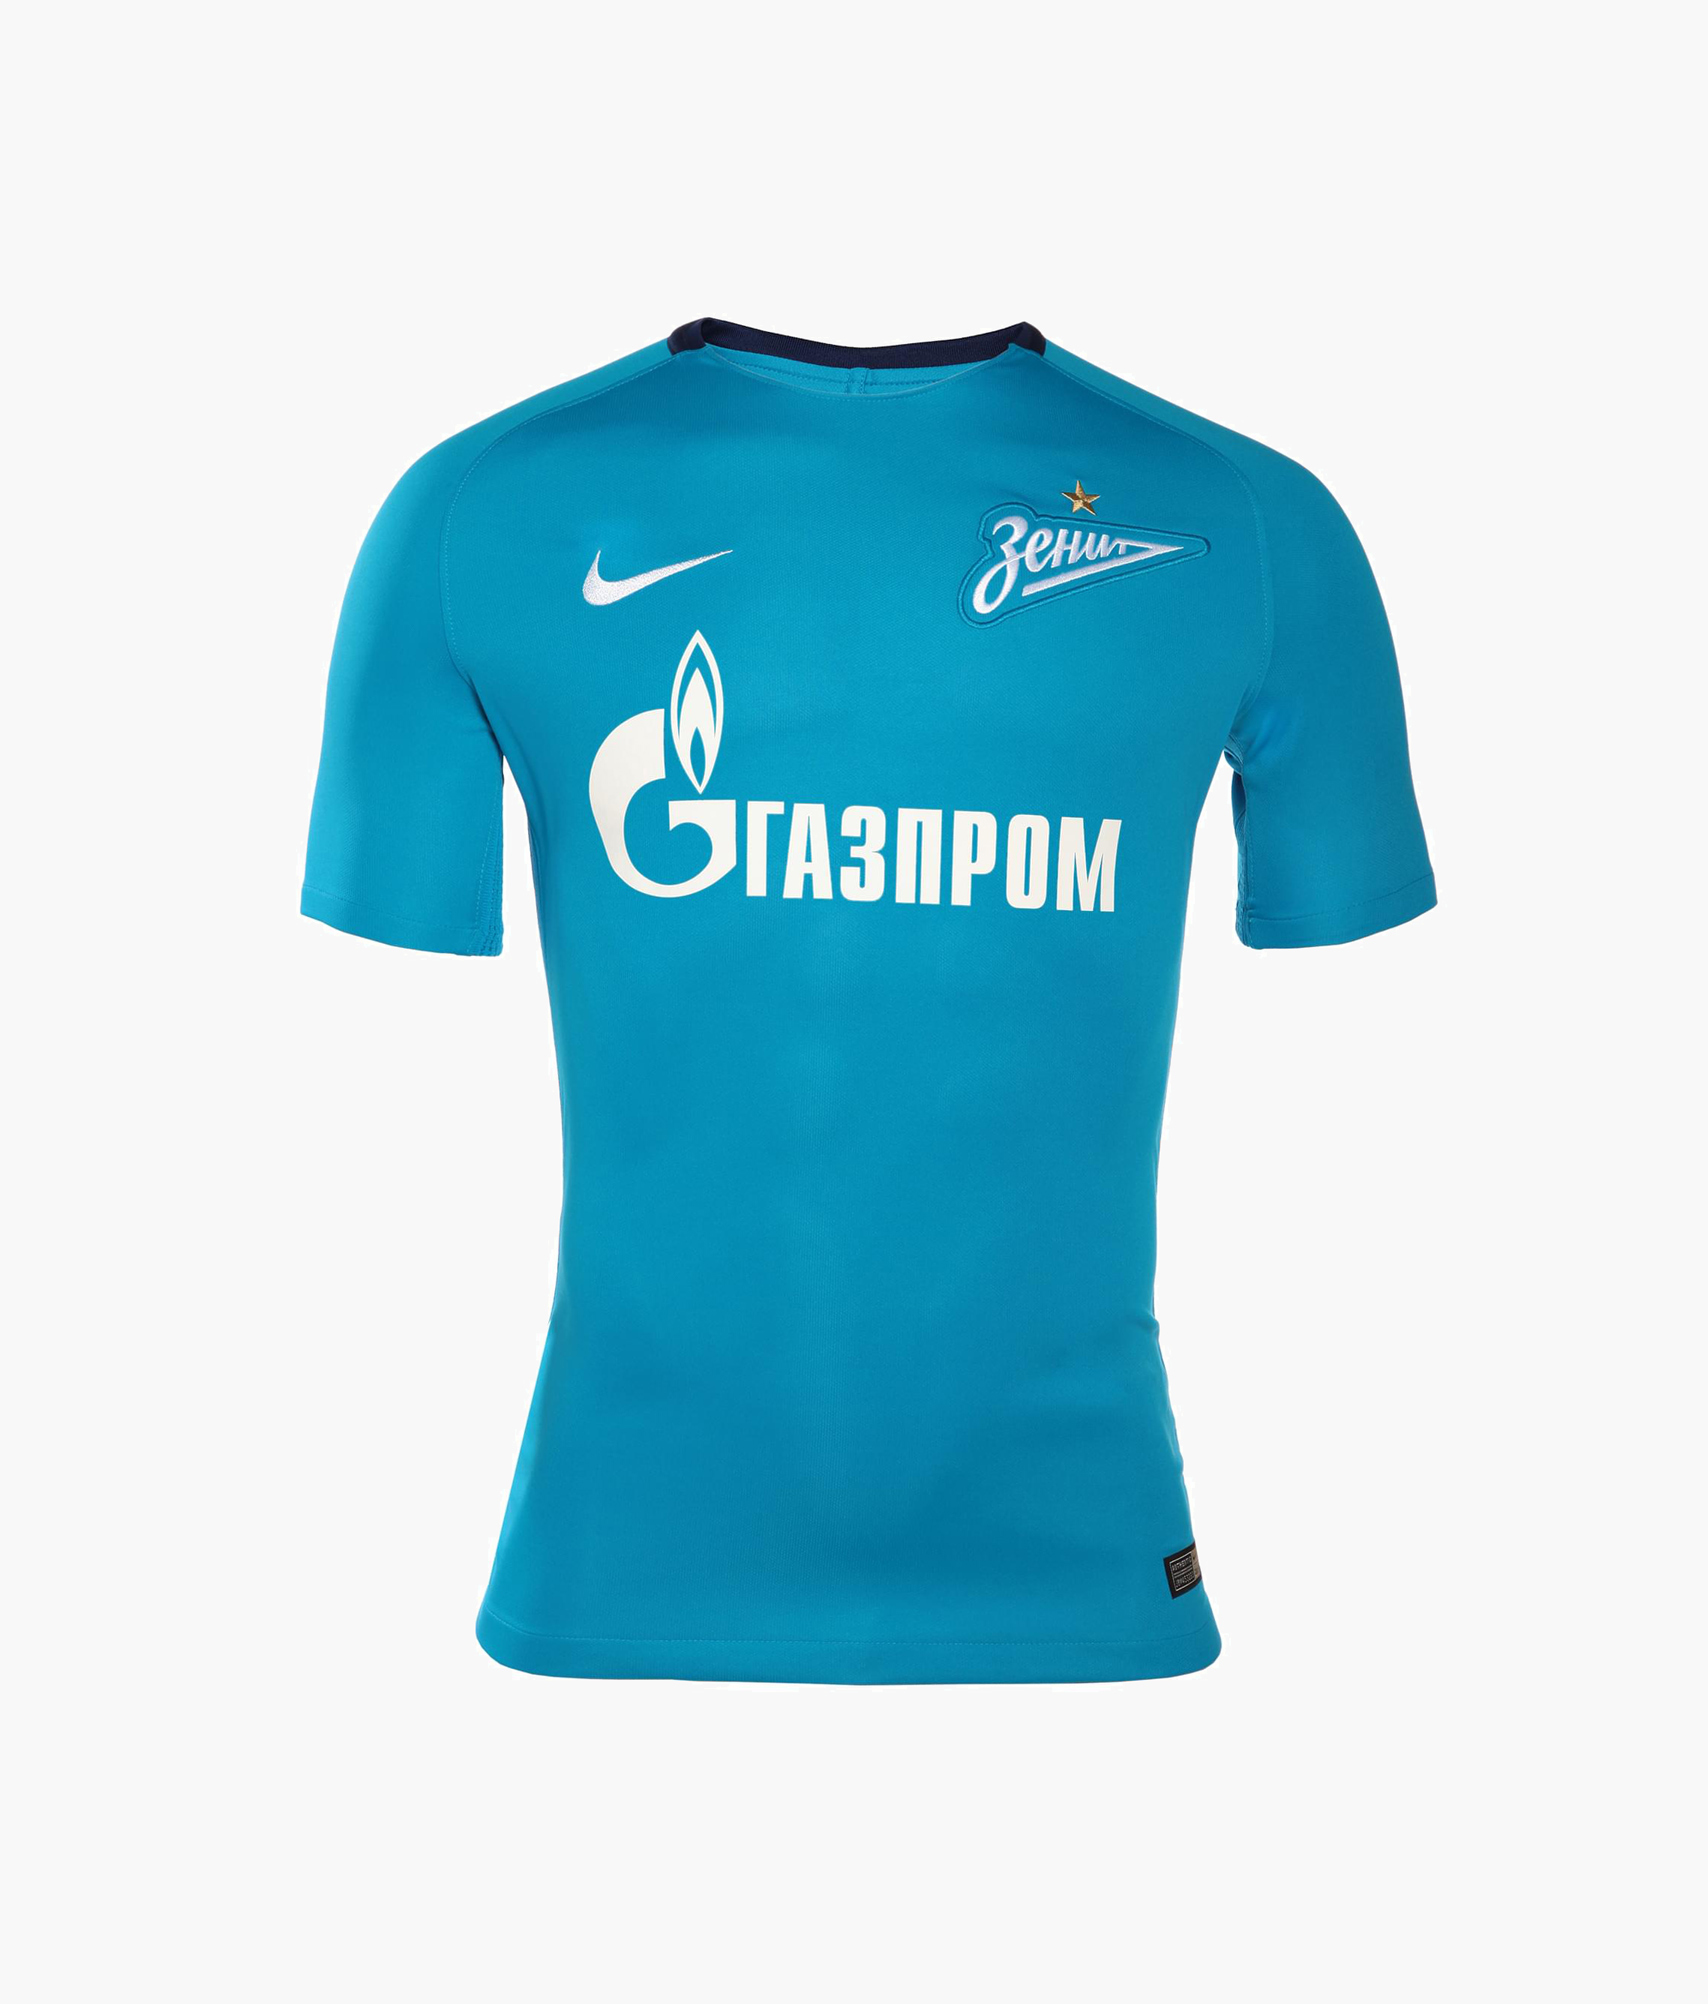 Оригинальная домашняя футболка Nike сезона 2017/2018 Nike Цвет-Синий оригинальная домашняя футболка nike дзюба 22 2018 19 nike